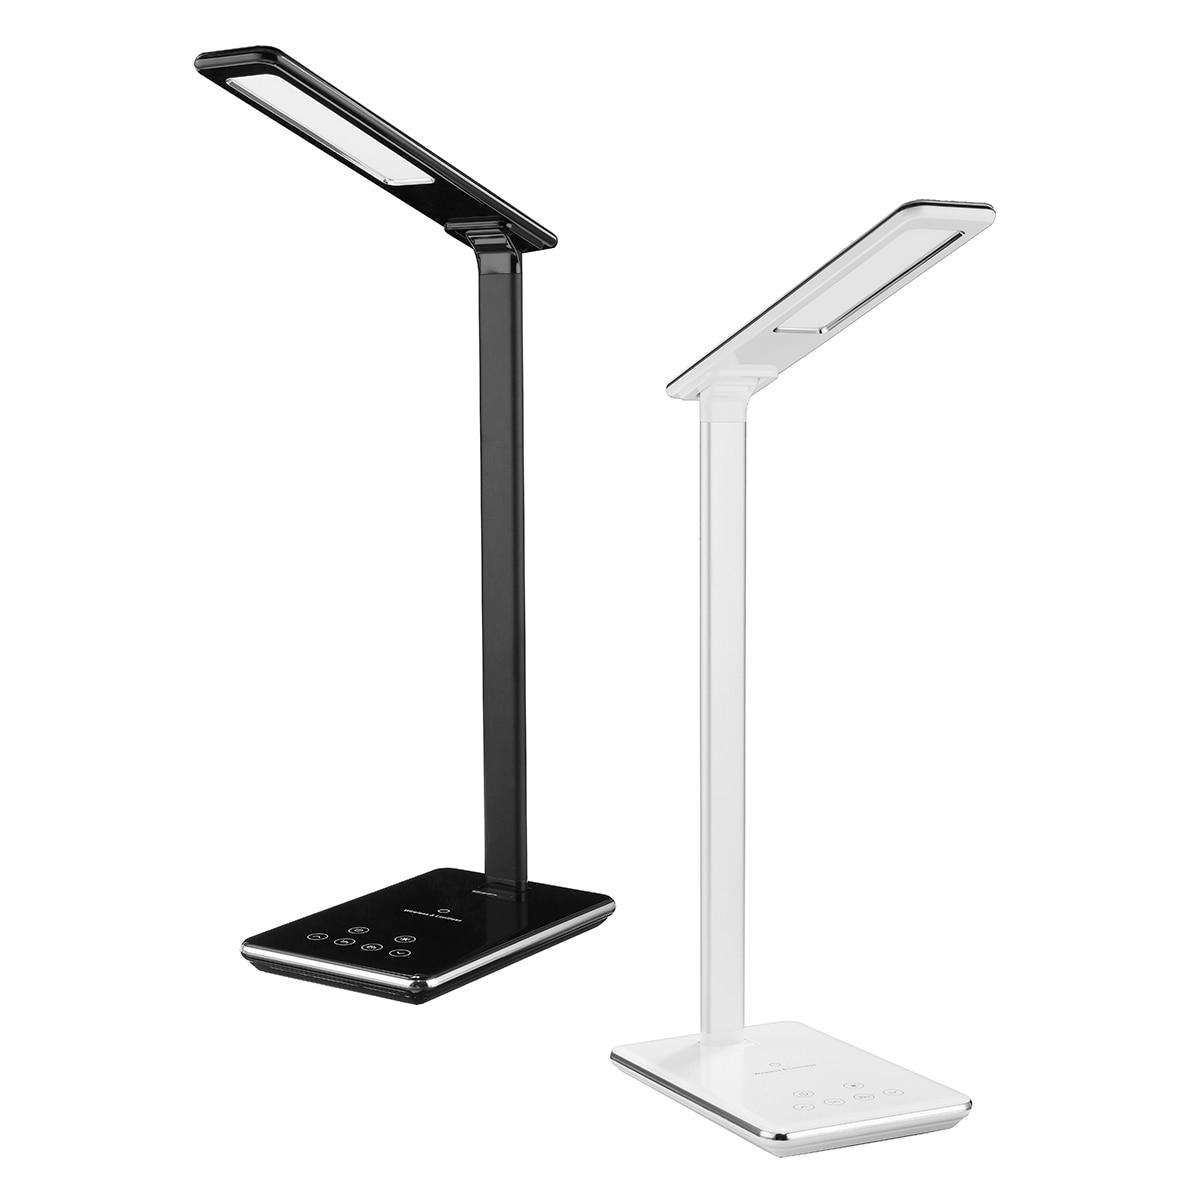 Wireless Charging Pad Light WhiteNordics